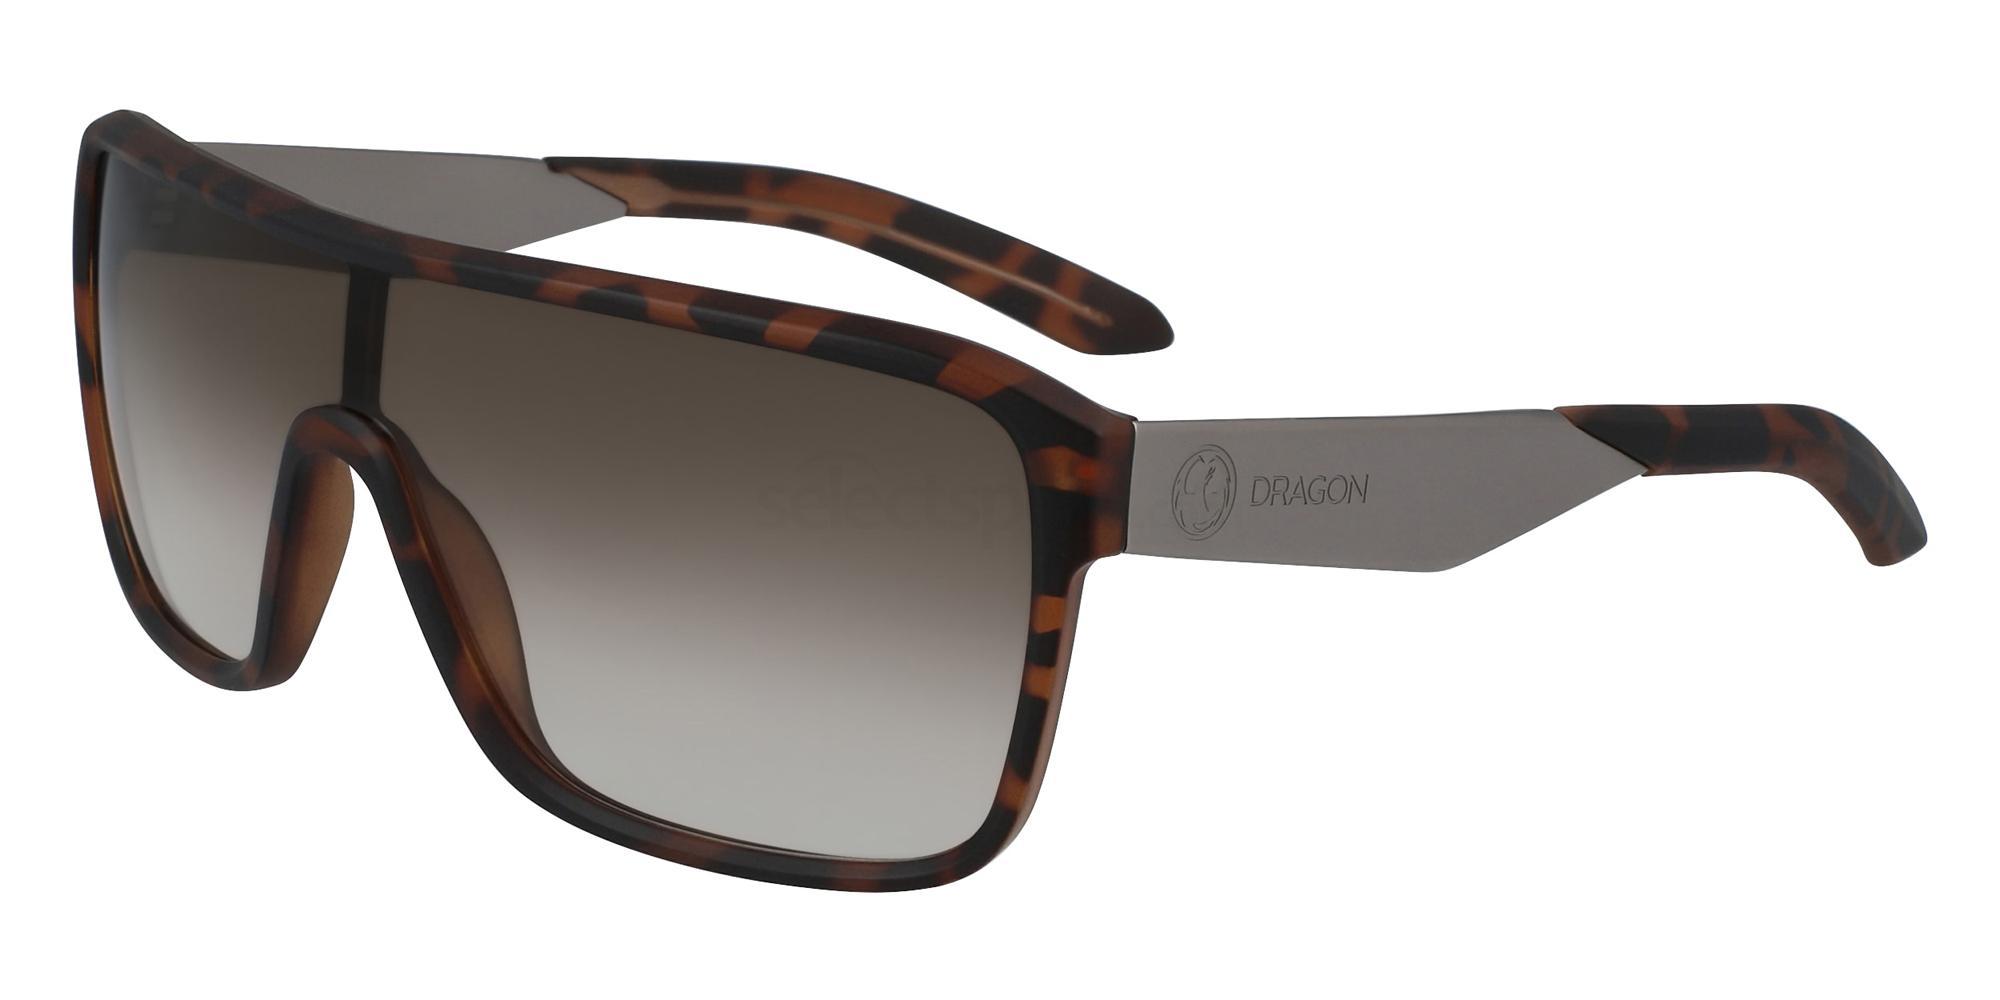 244 DR AMP LL Sunglasses, Dragon